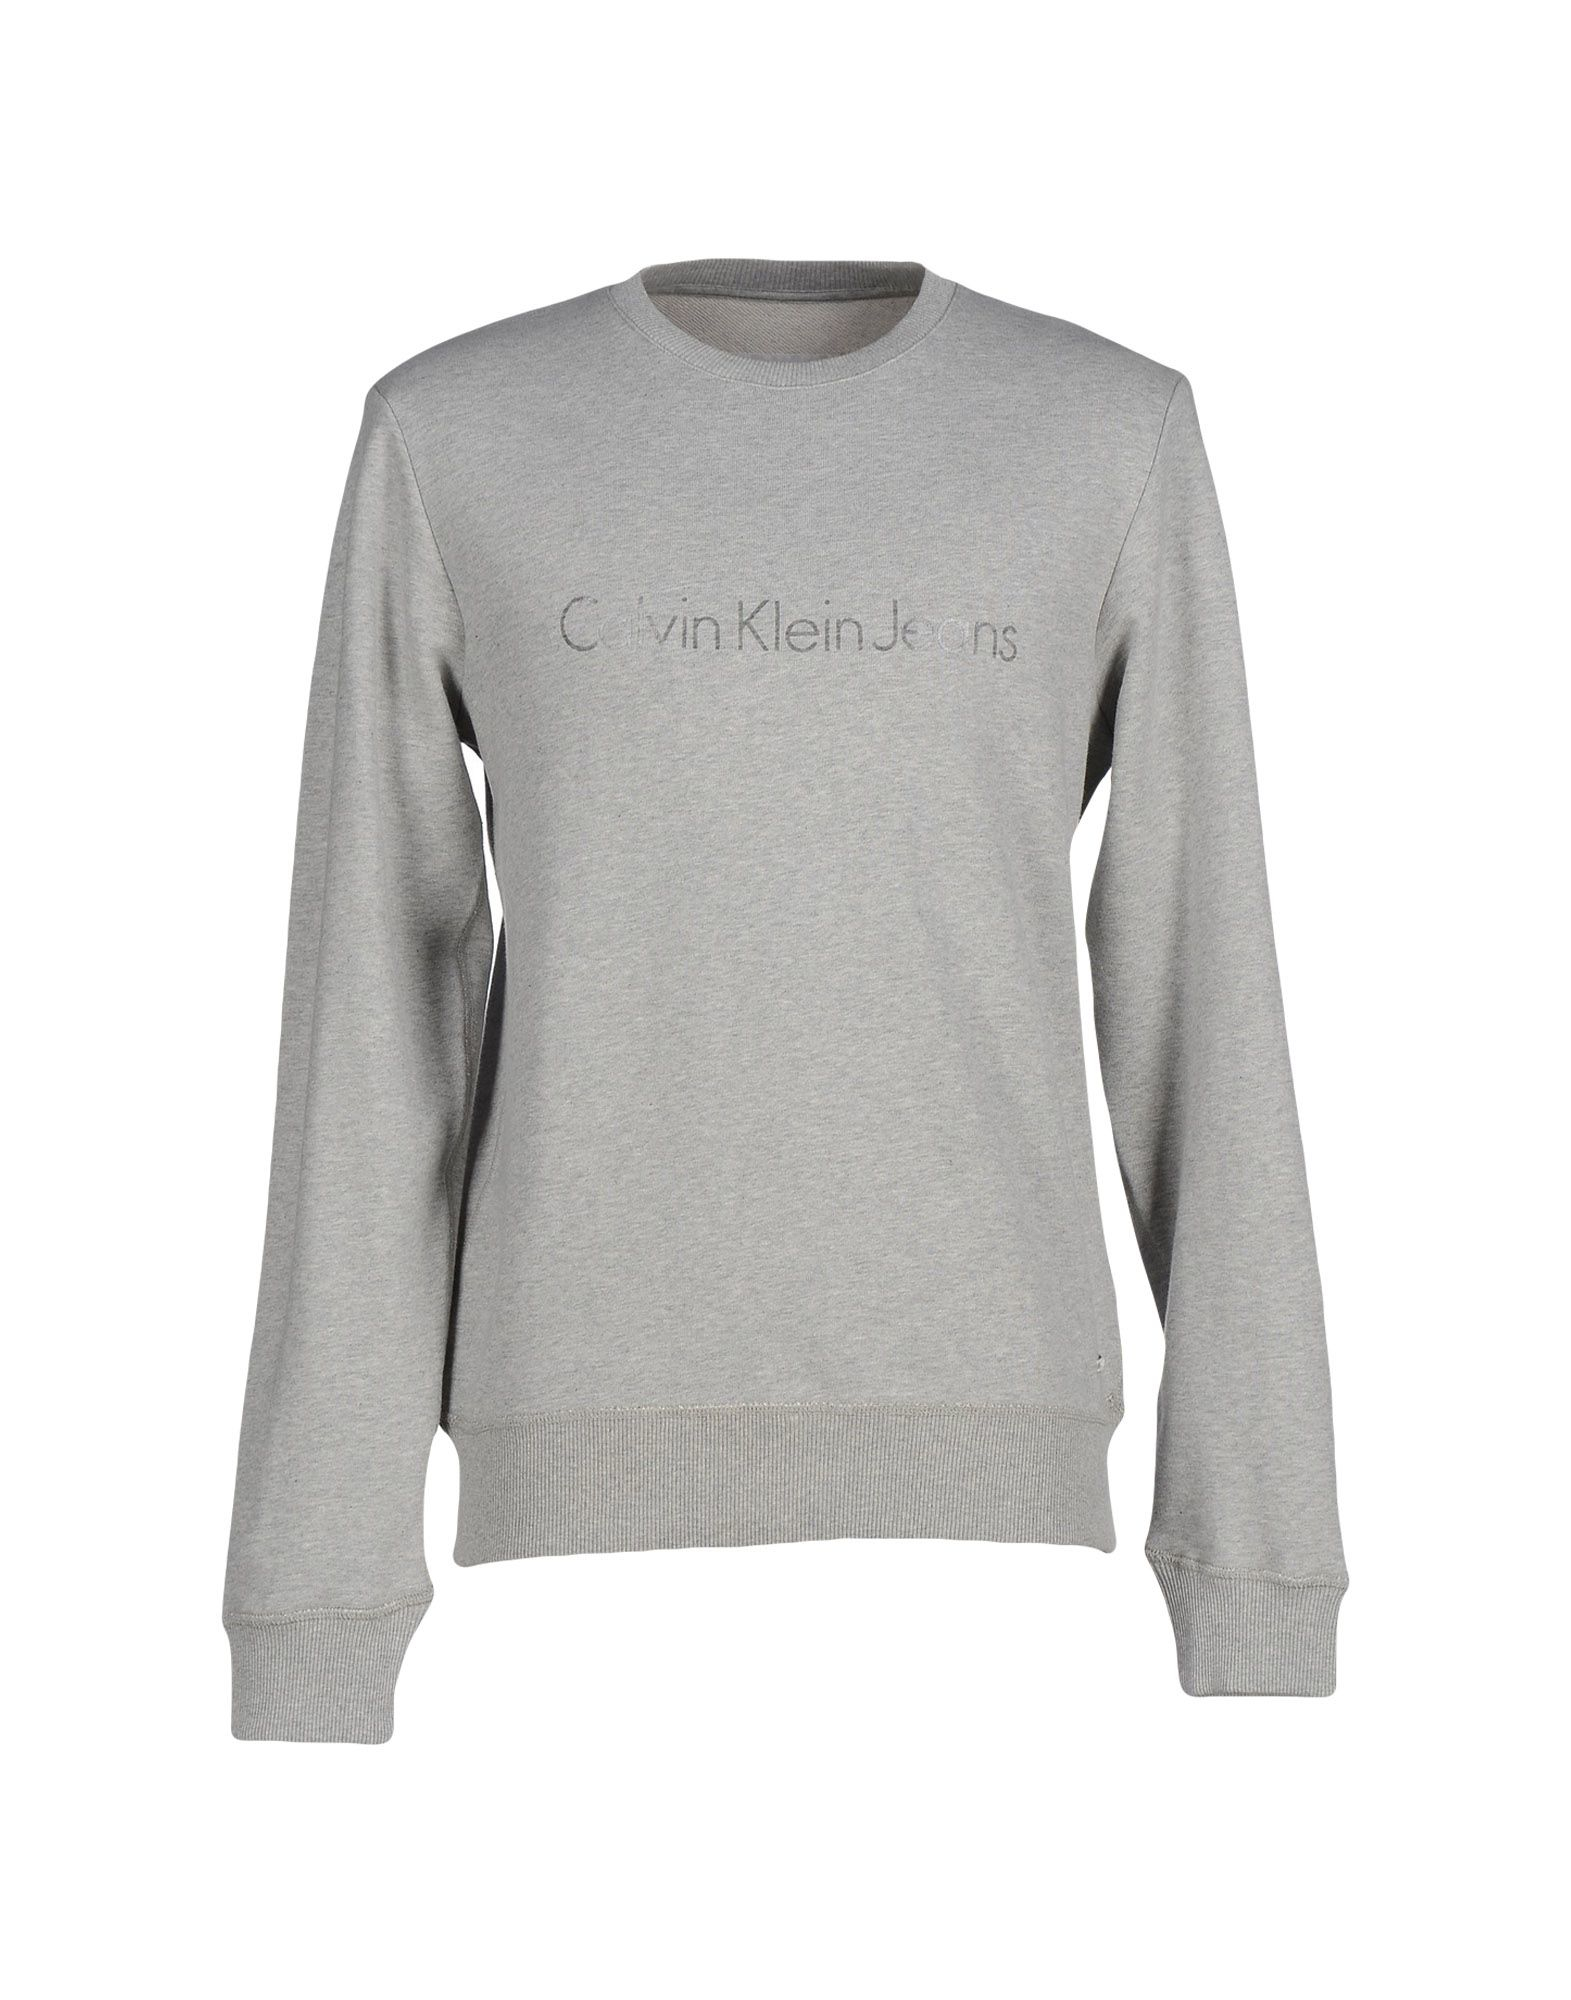 calvin klein jeans sweatshirt in gray for men lyst. Black Bedroom Furniture Sets. Home Design Ideas